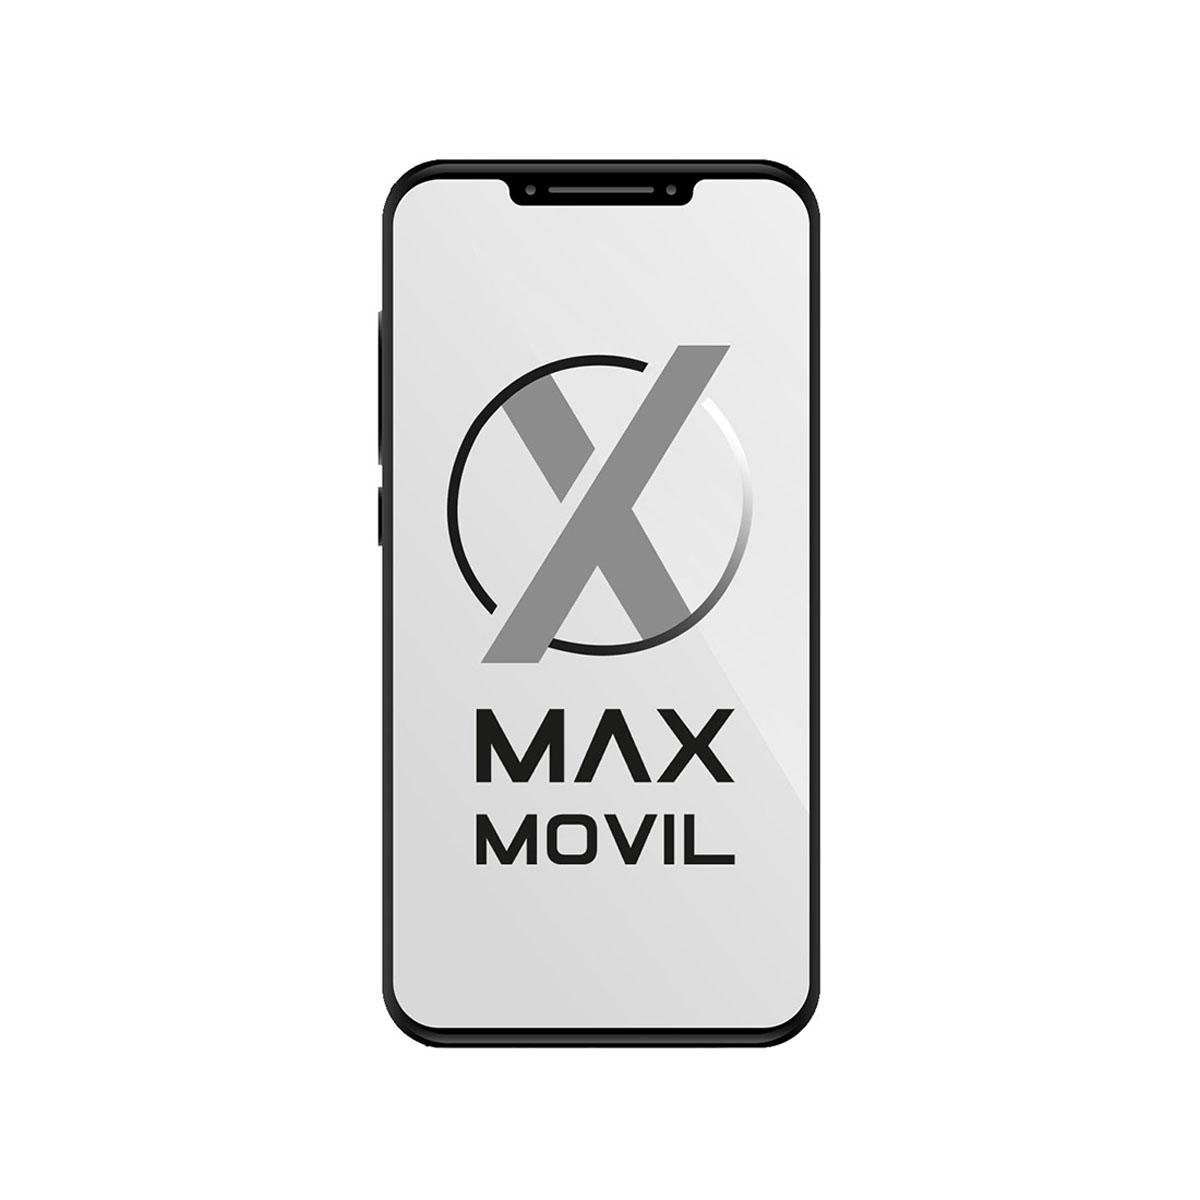 OnePlus 7 Pro 8GB/256GB Gris Espejo Dual SIM